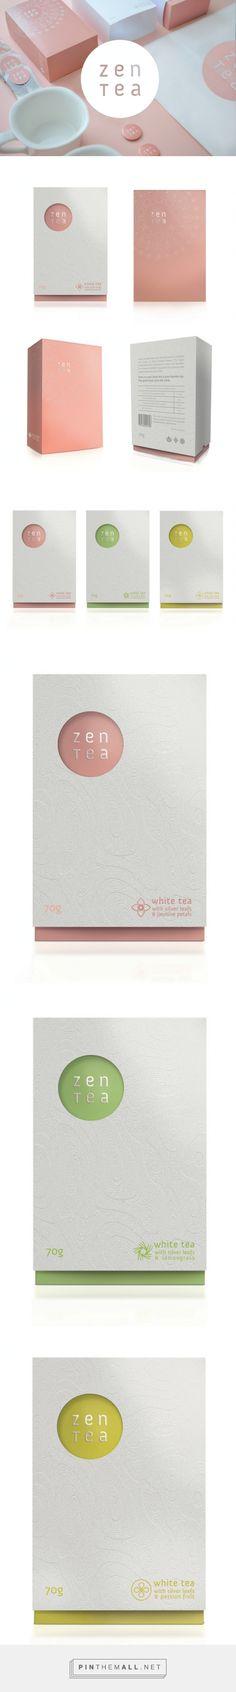 Zen Tea (Concept) by Konrad Sybilski